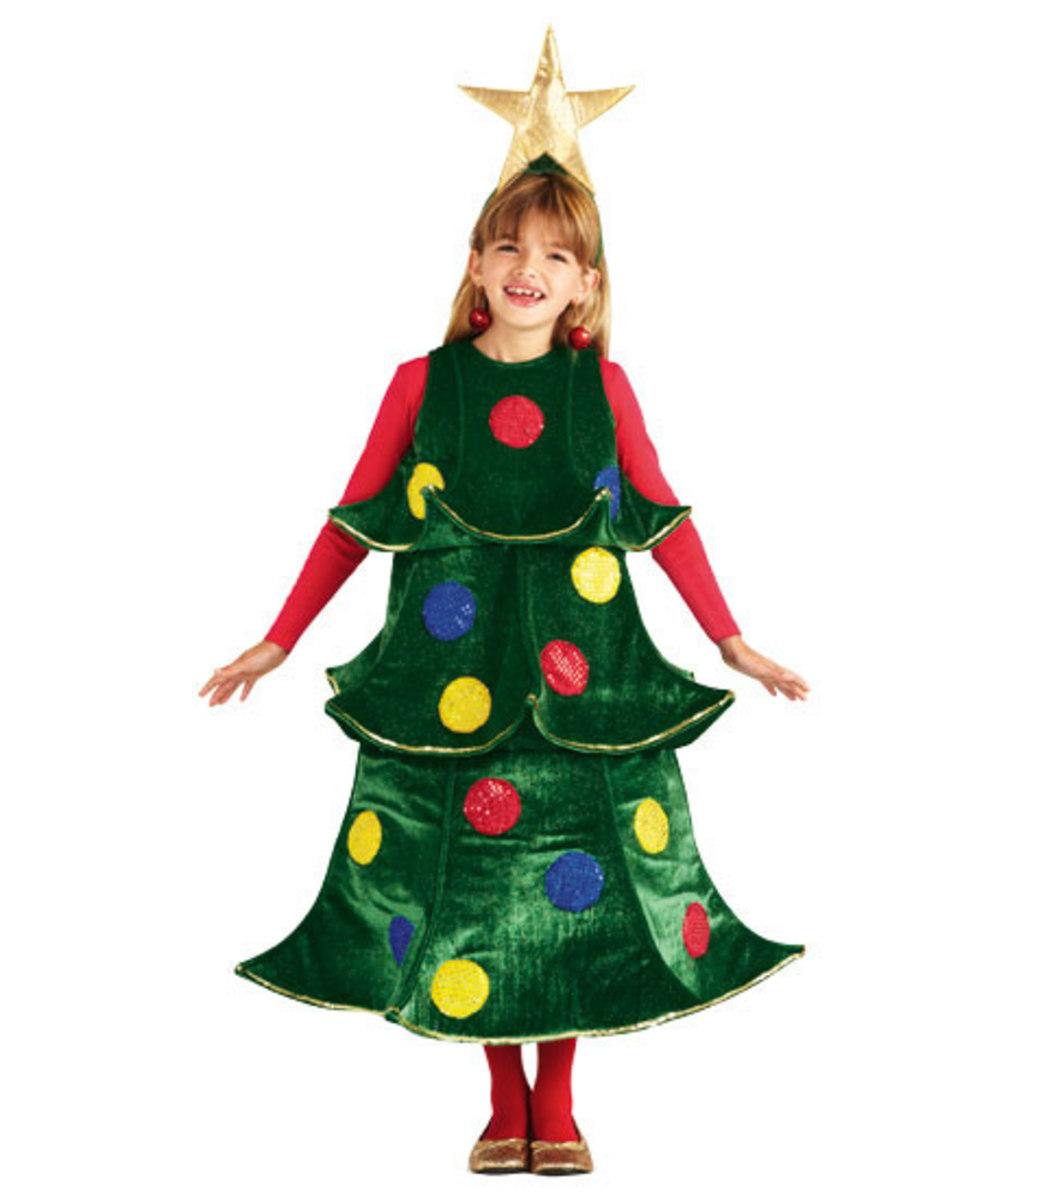 Christmas Tree Dress Costume: Christmas Tree Costume Ideas And Inspiration